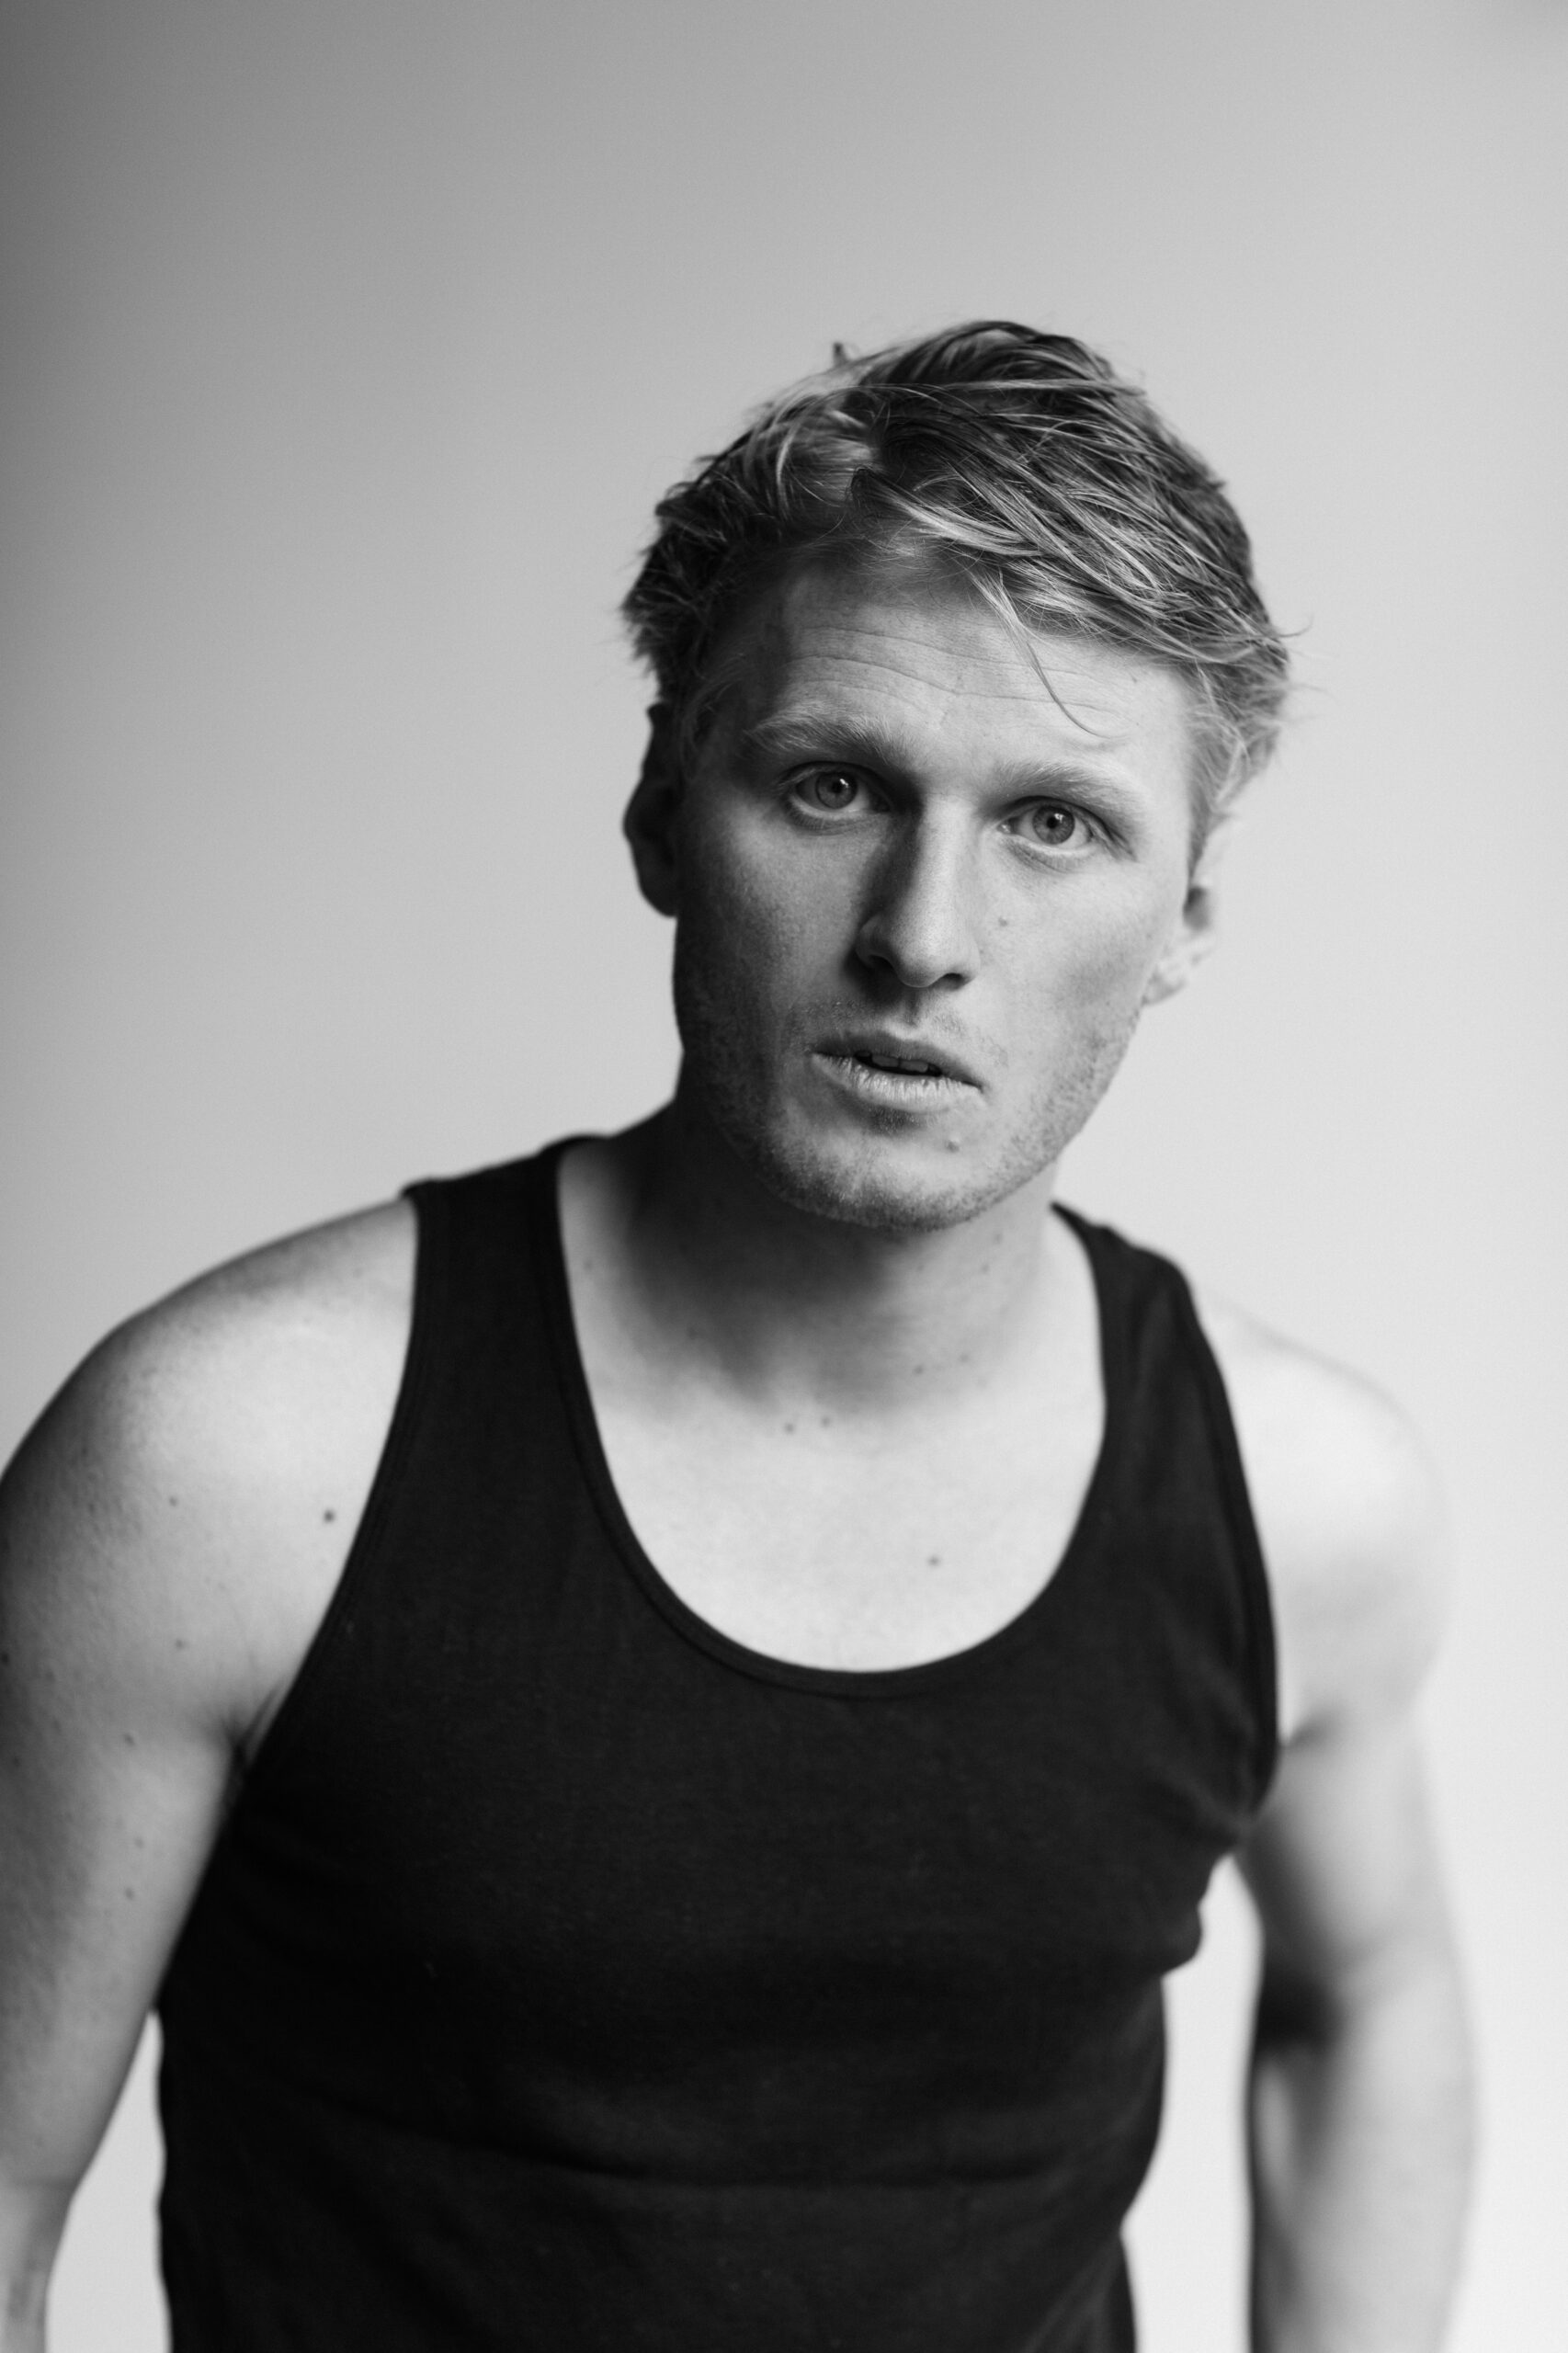 Sven Serkins